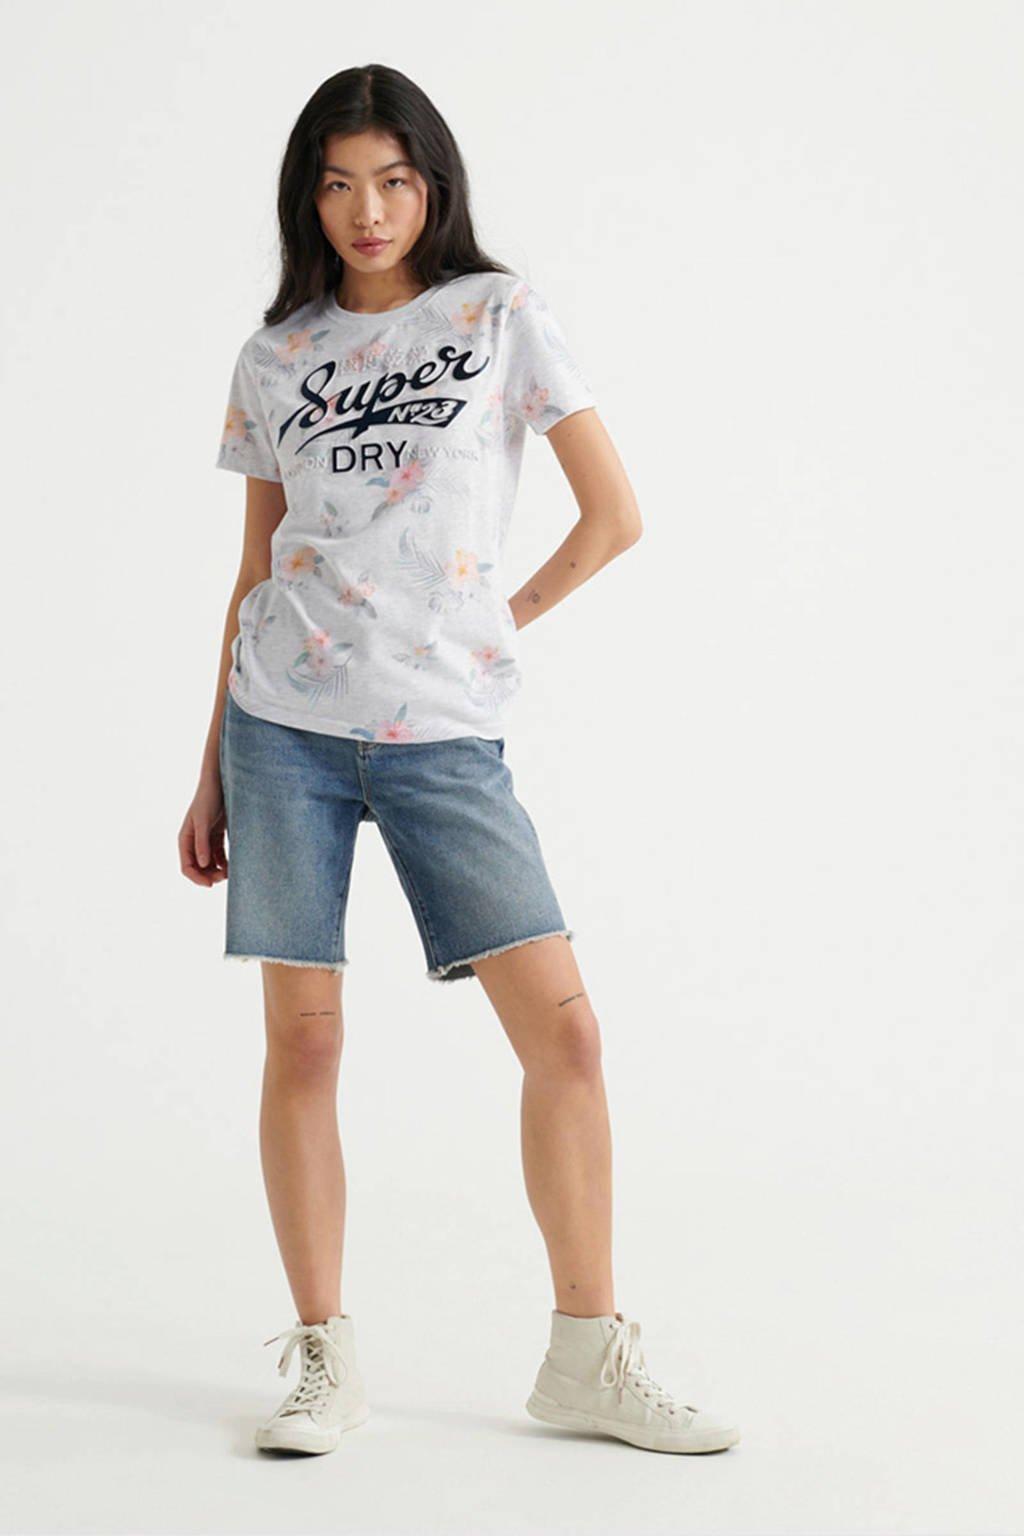 Superdry T-shirt met printopdruk  lichtgrijs melée/marine,  Lichtgrijs melée/marine